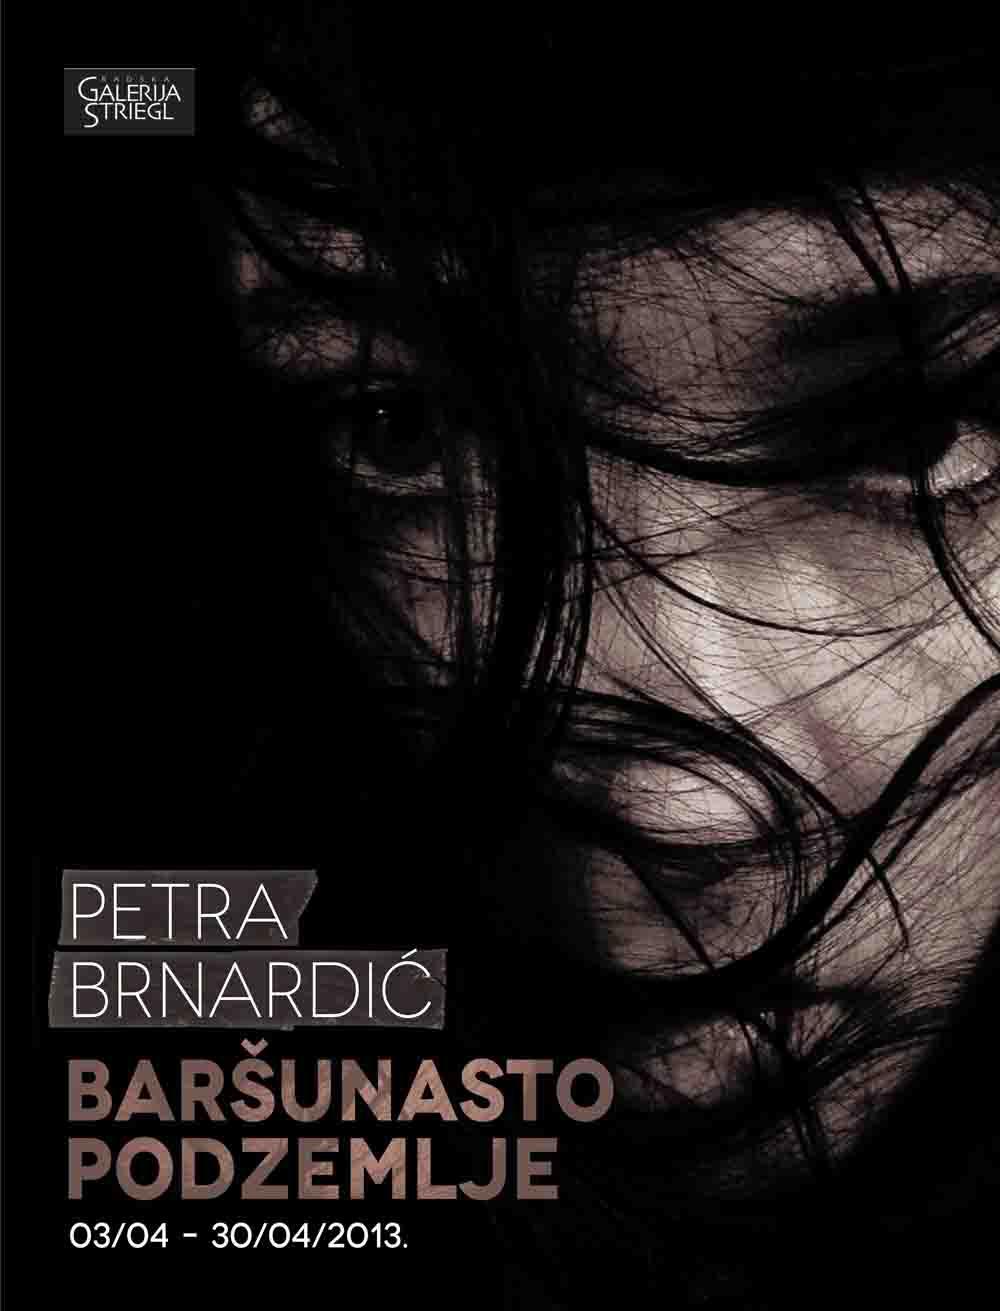 Petra Brnardic